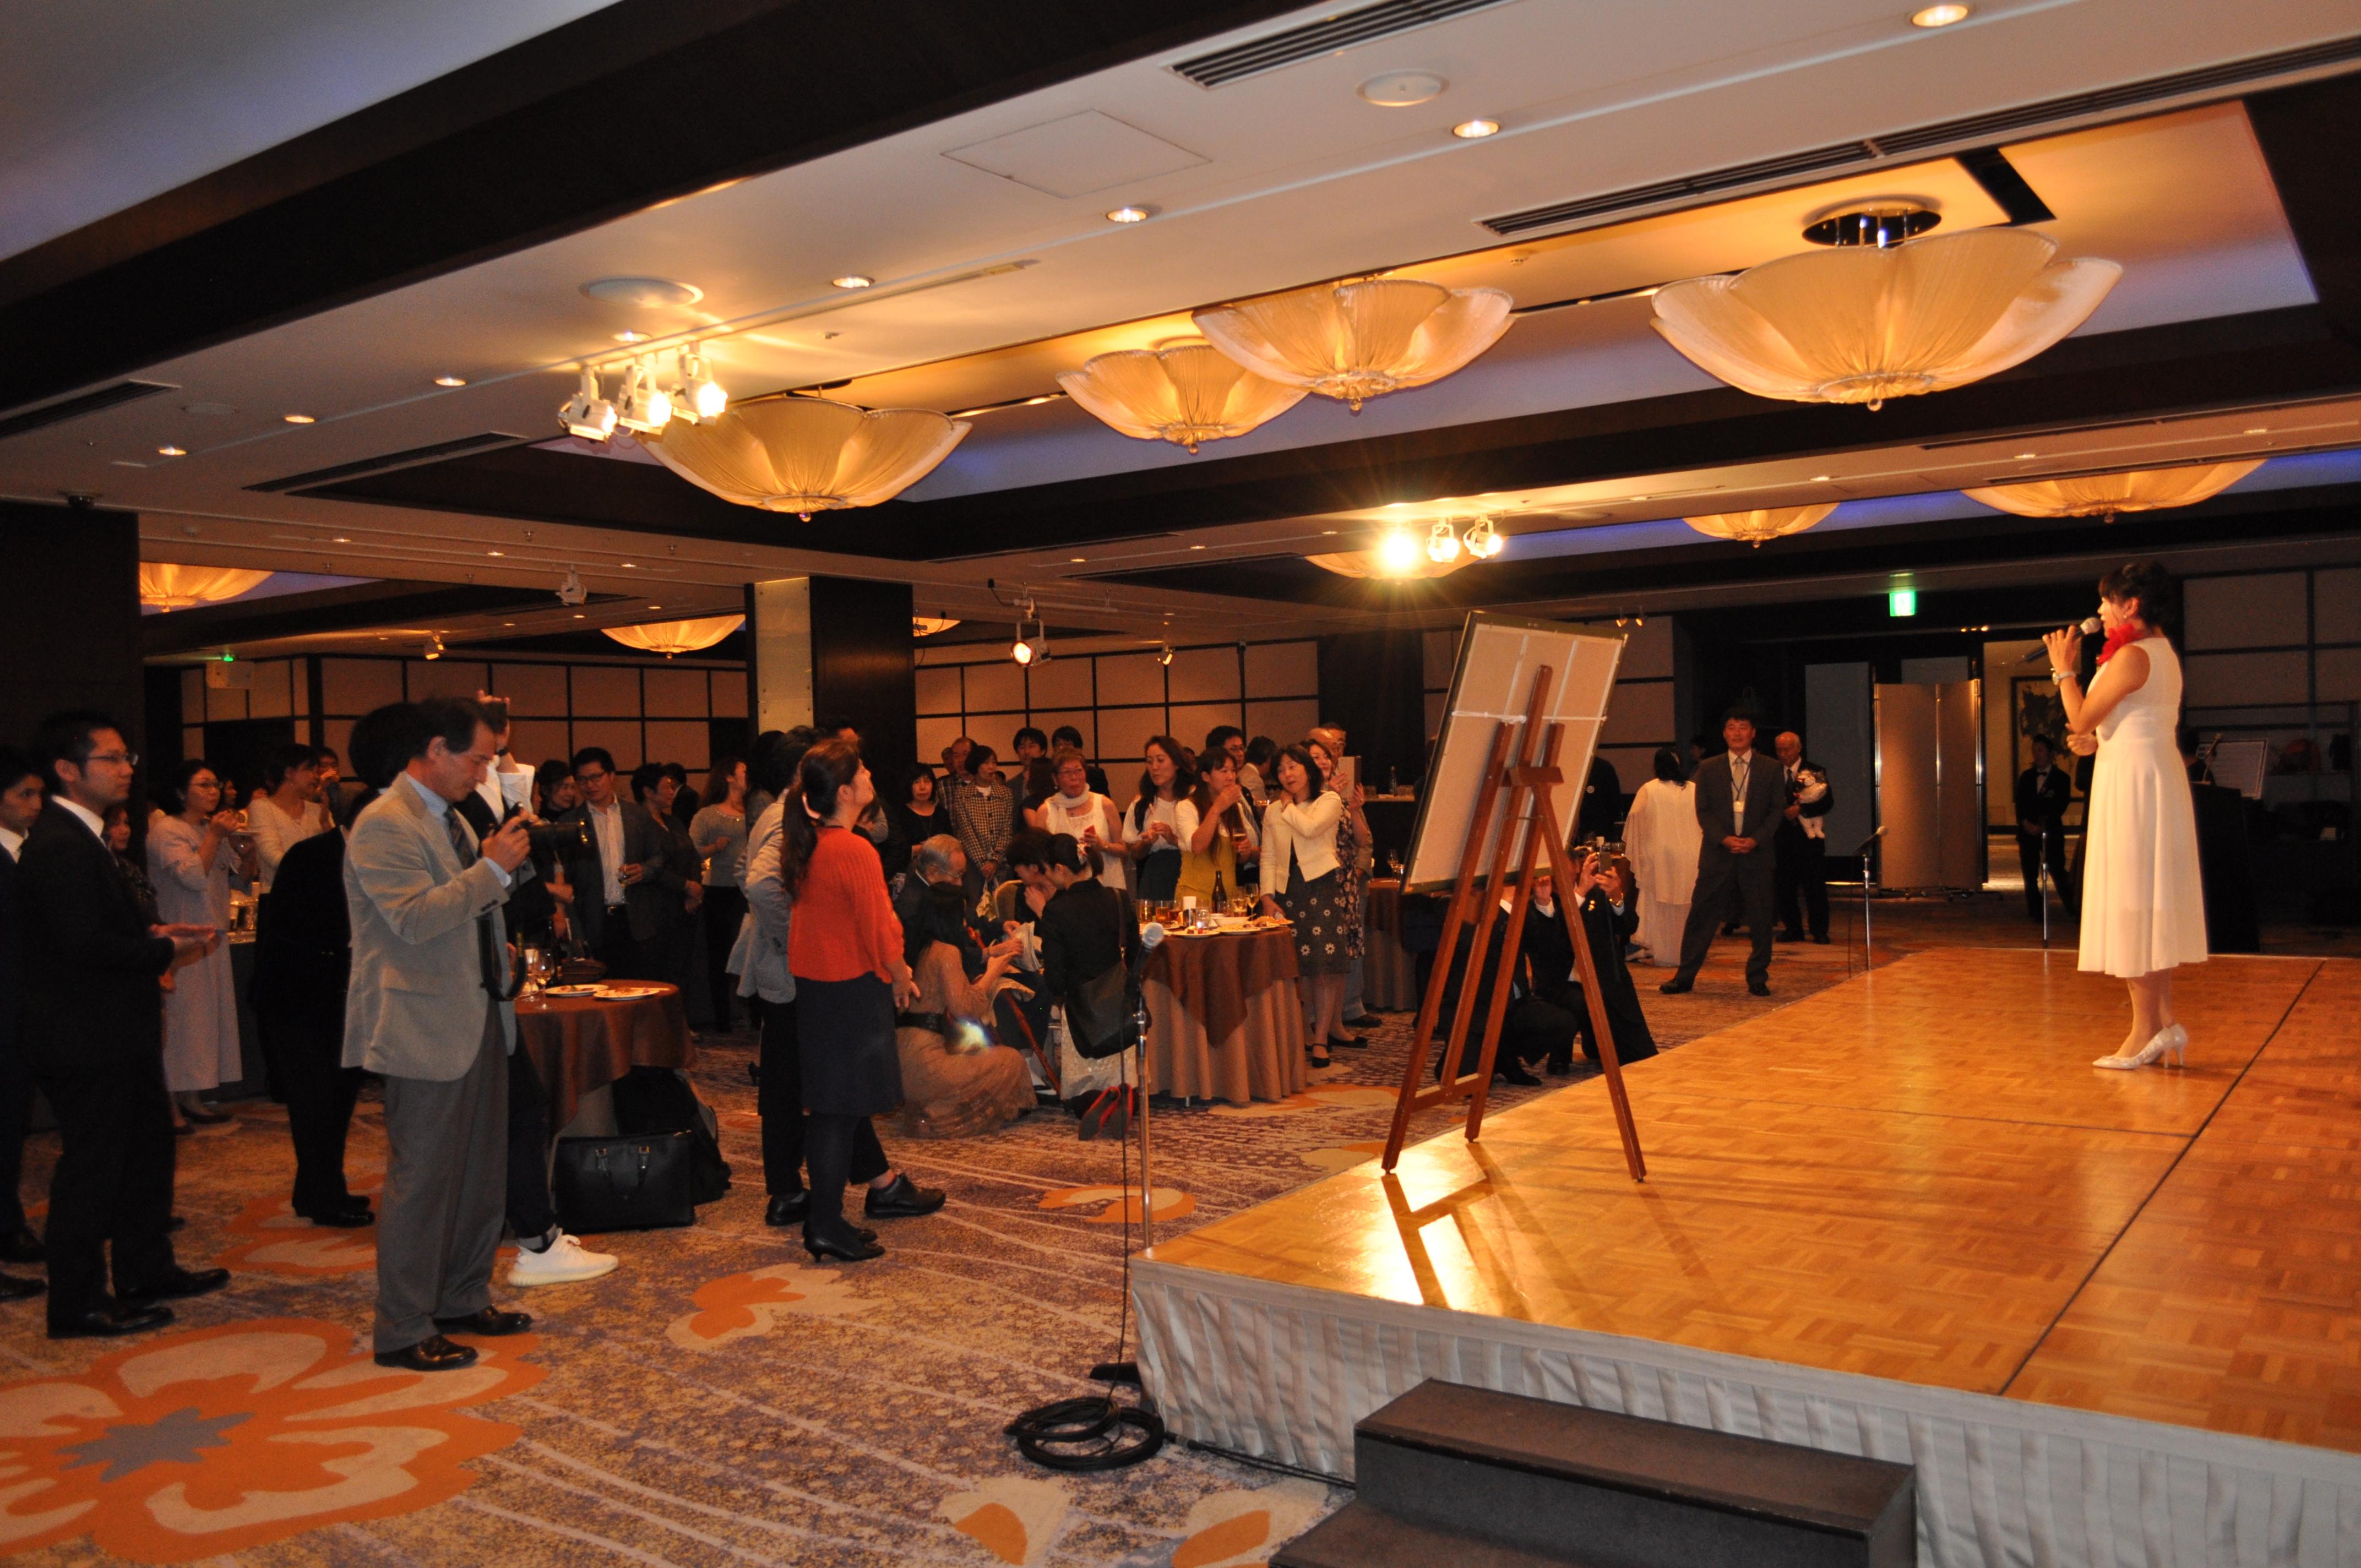 DSC 0484 - 第6回思風会全国大会2018in東京開催